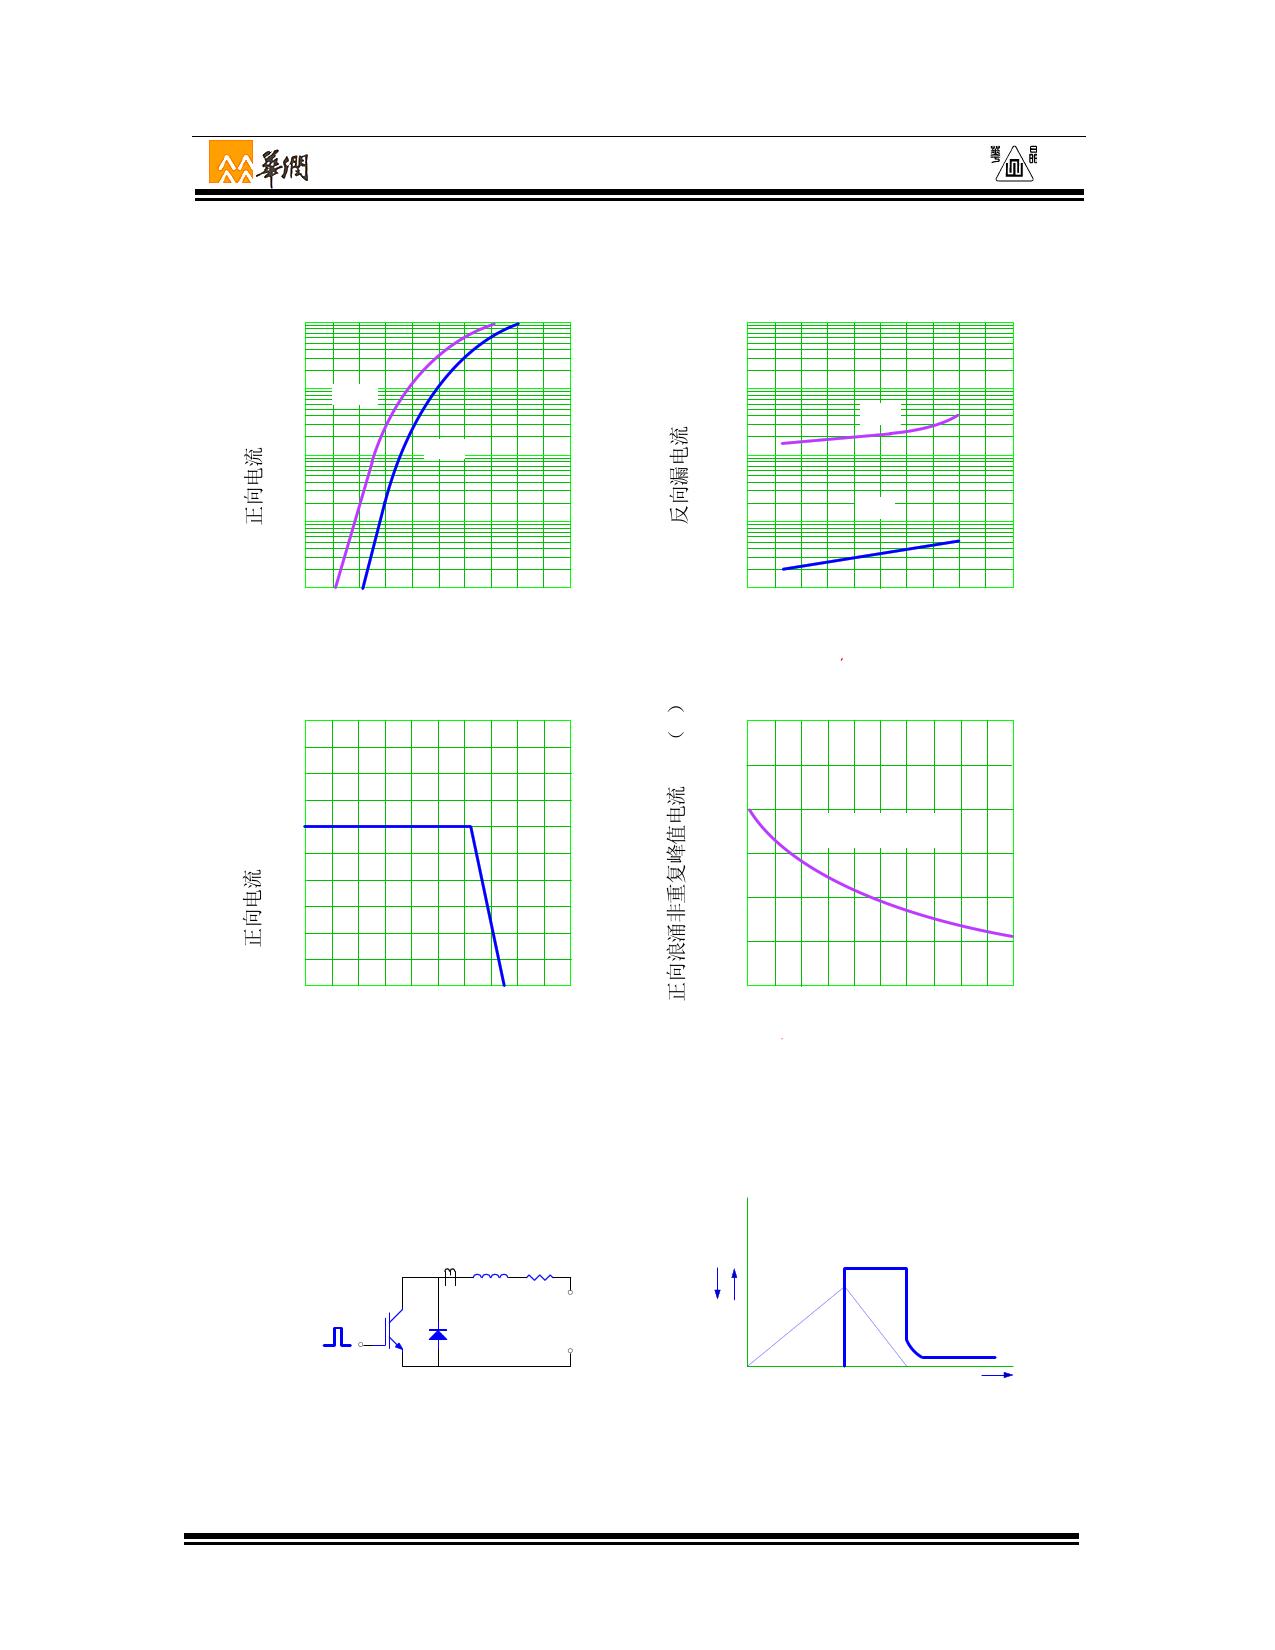 2CR122A8S pdf, ピン配列